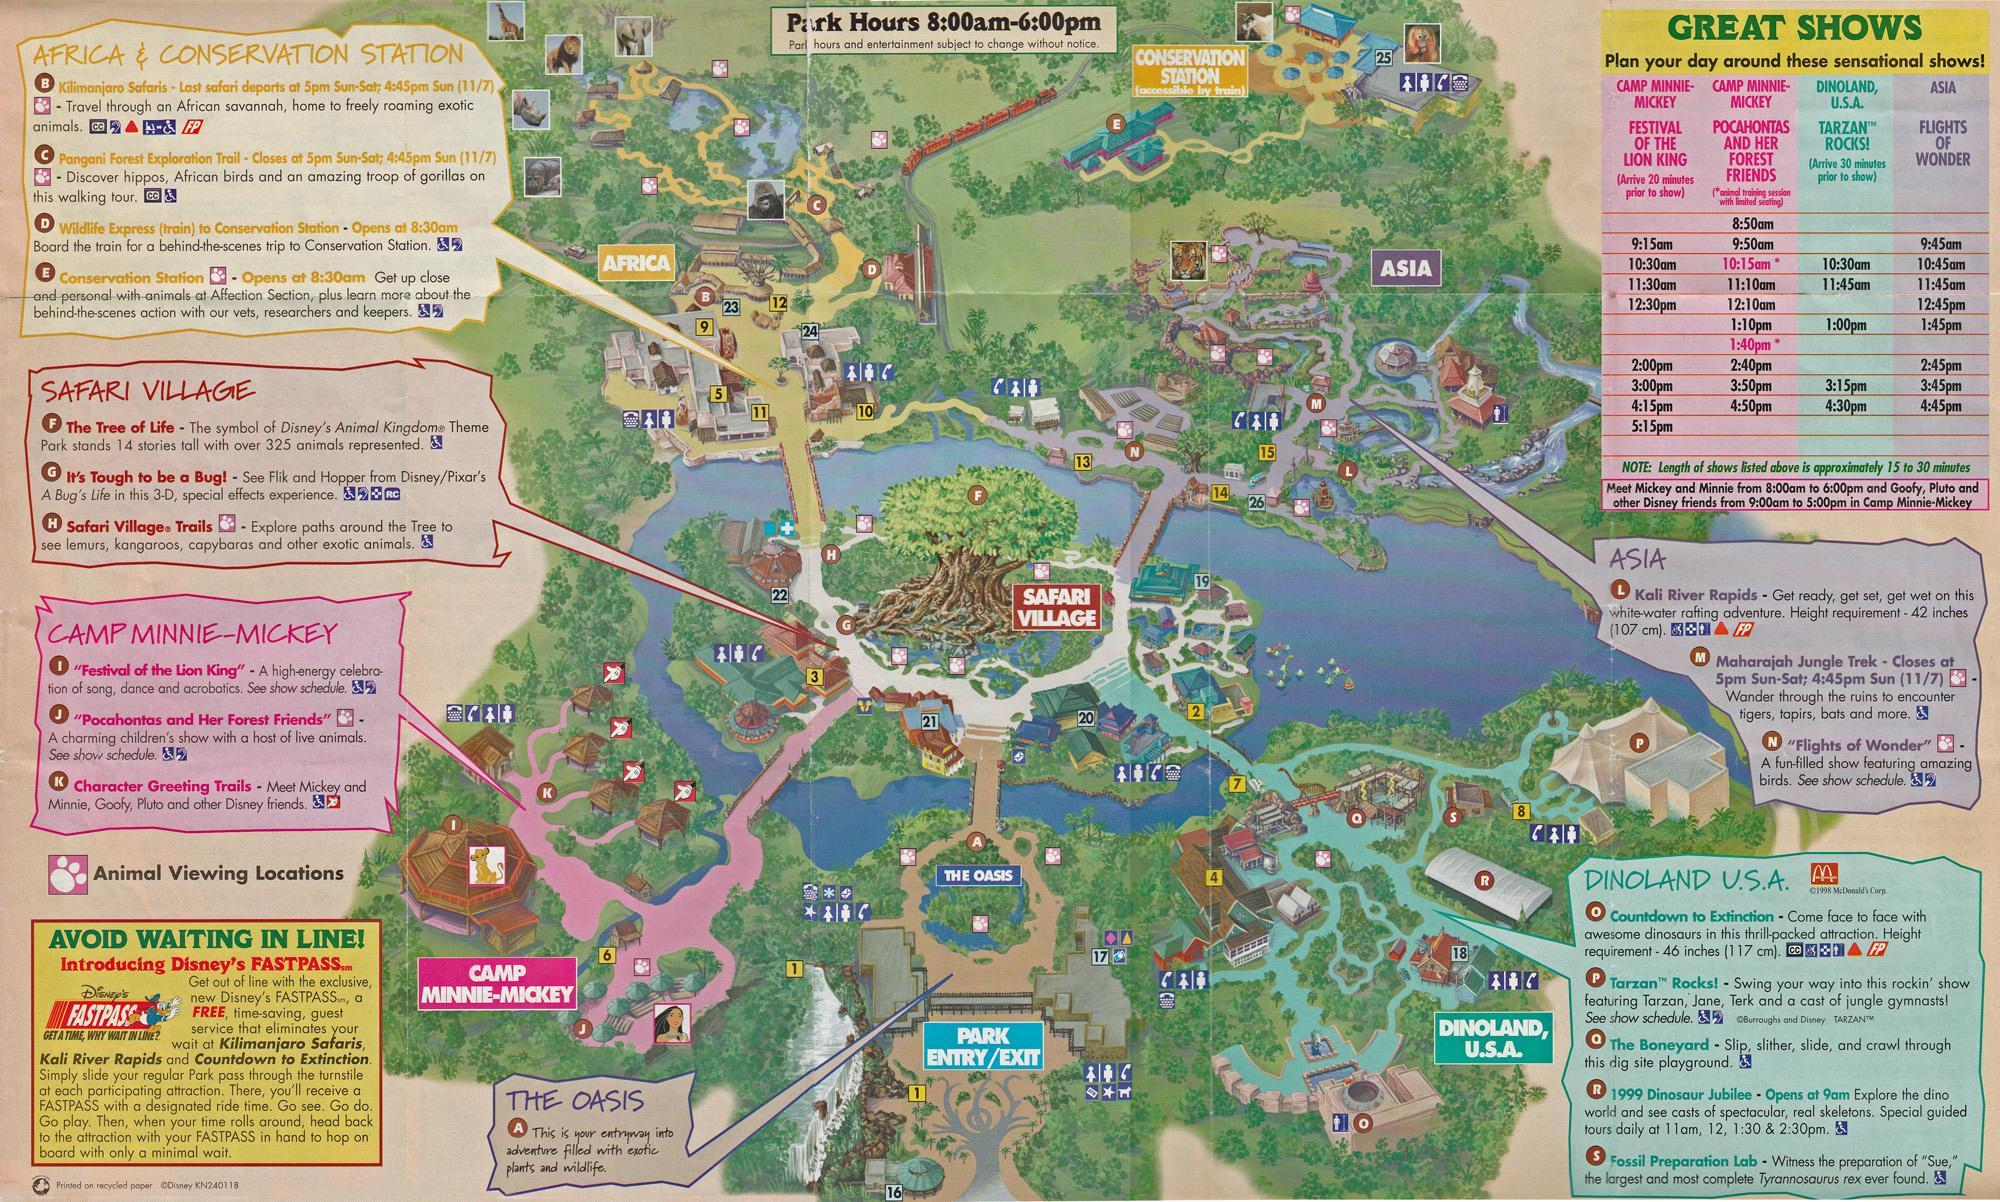 Disney\'s Wild Animal Kingdom (All Ears® Guest Blog)